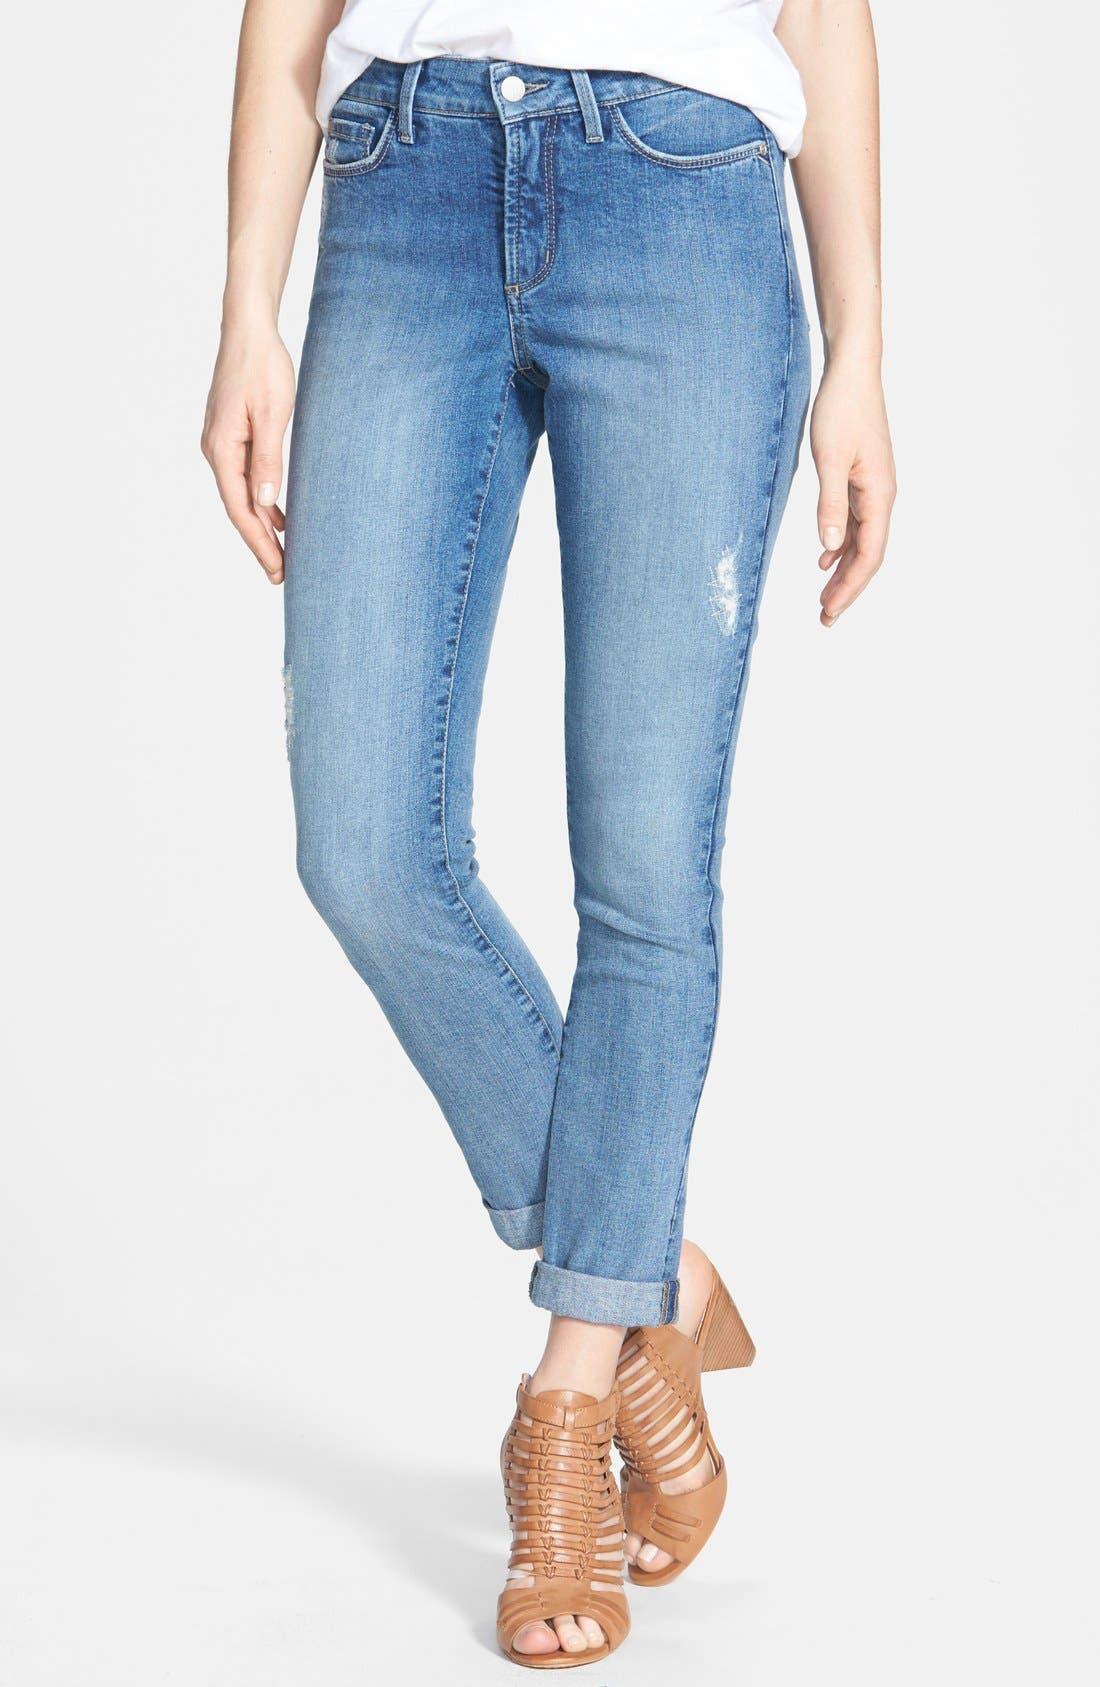 Alternate Image 1 Selected - NYDJ 'Anabelle' Stretch Skinny Jeans (Angora Lake) (Regular & Petite)